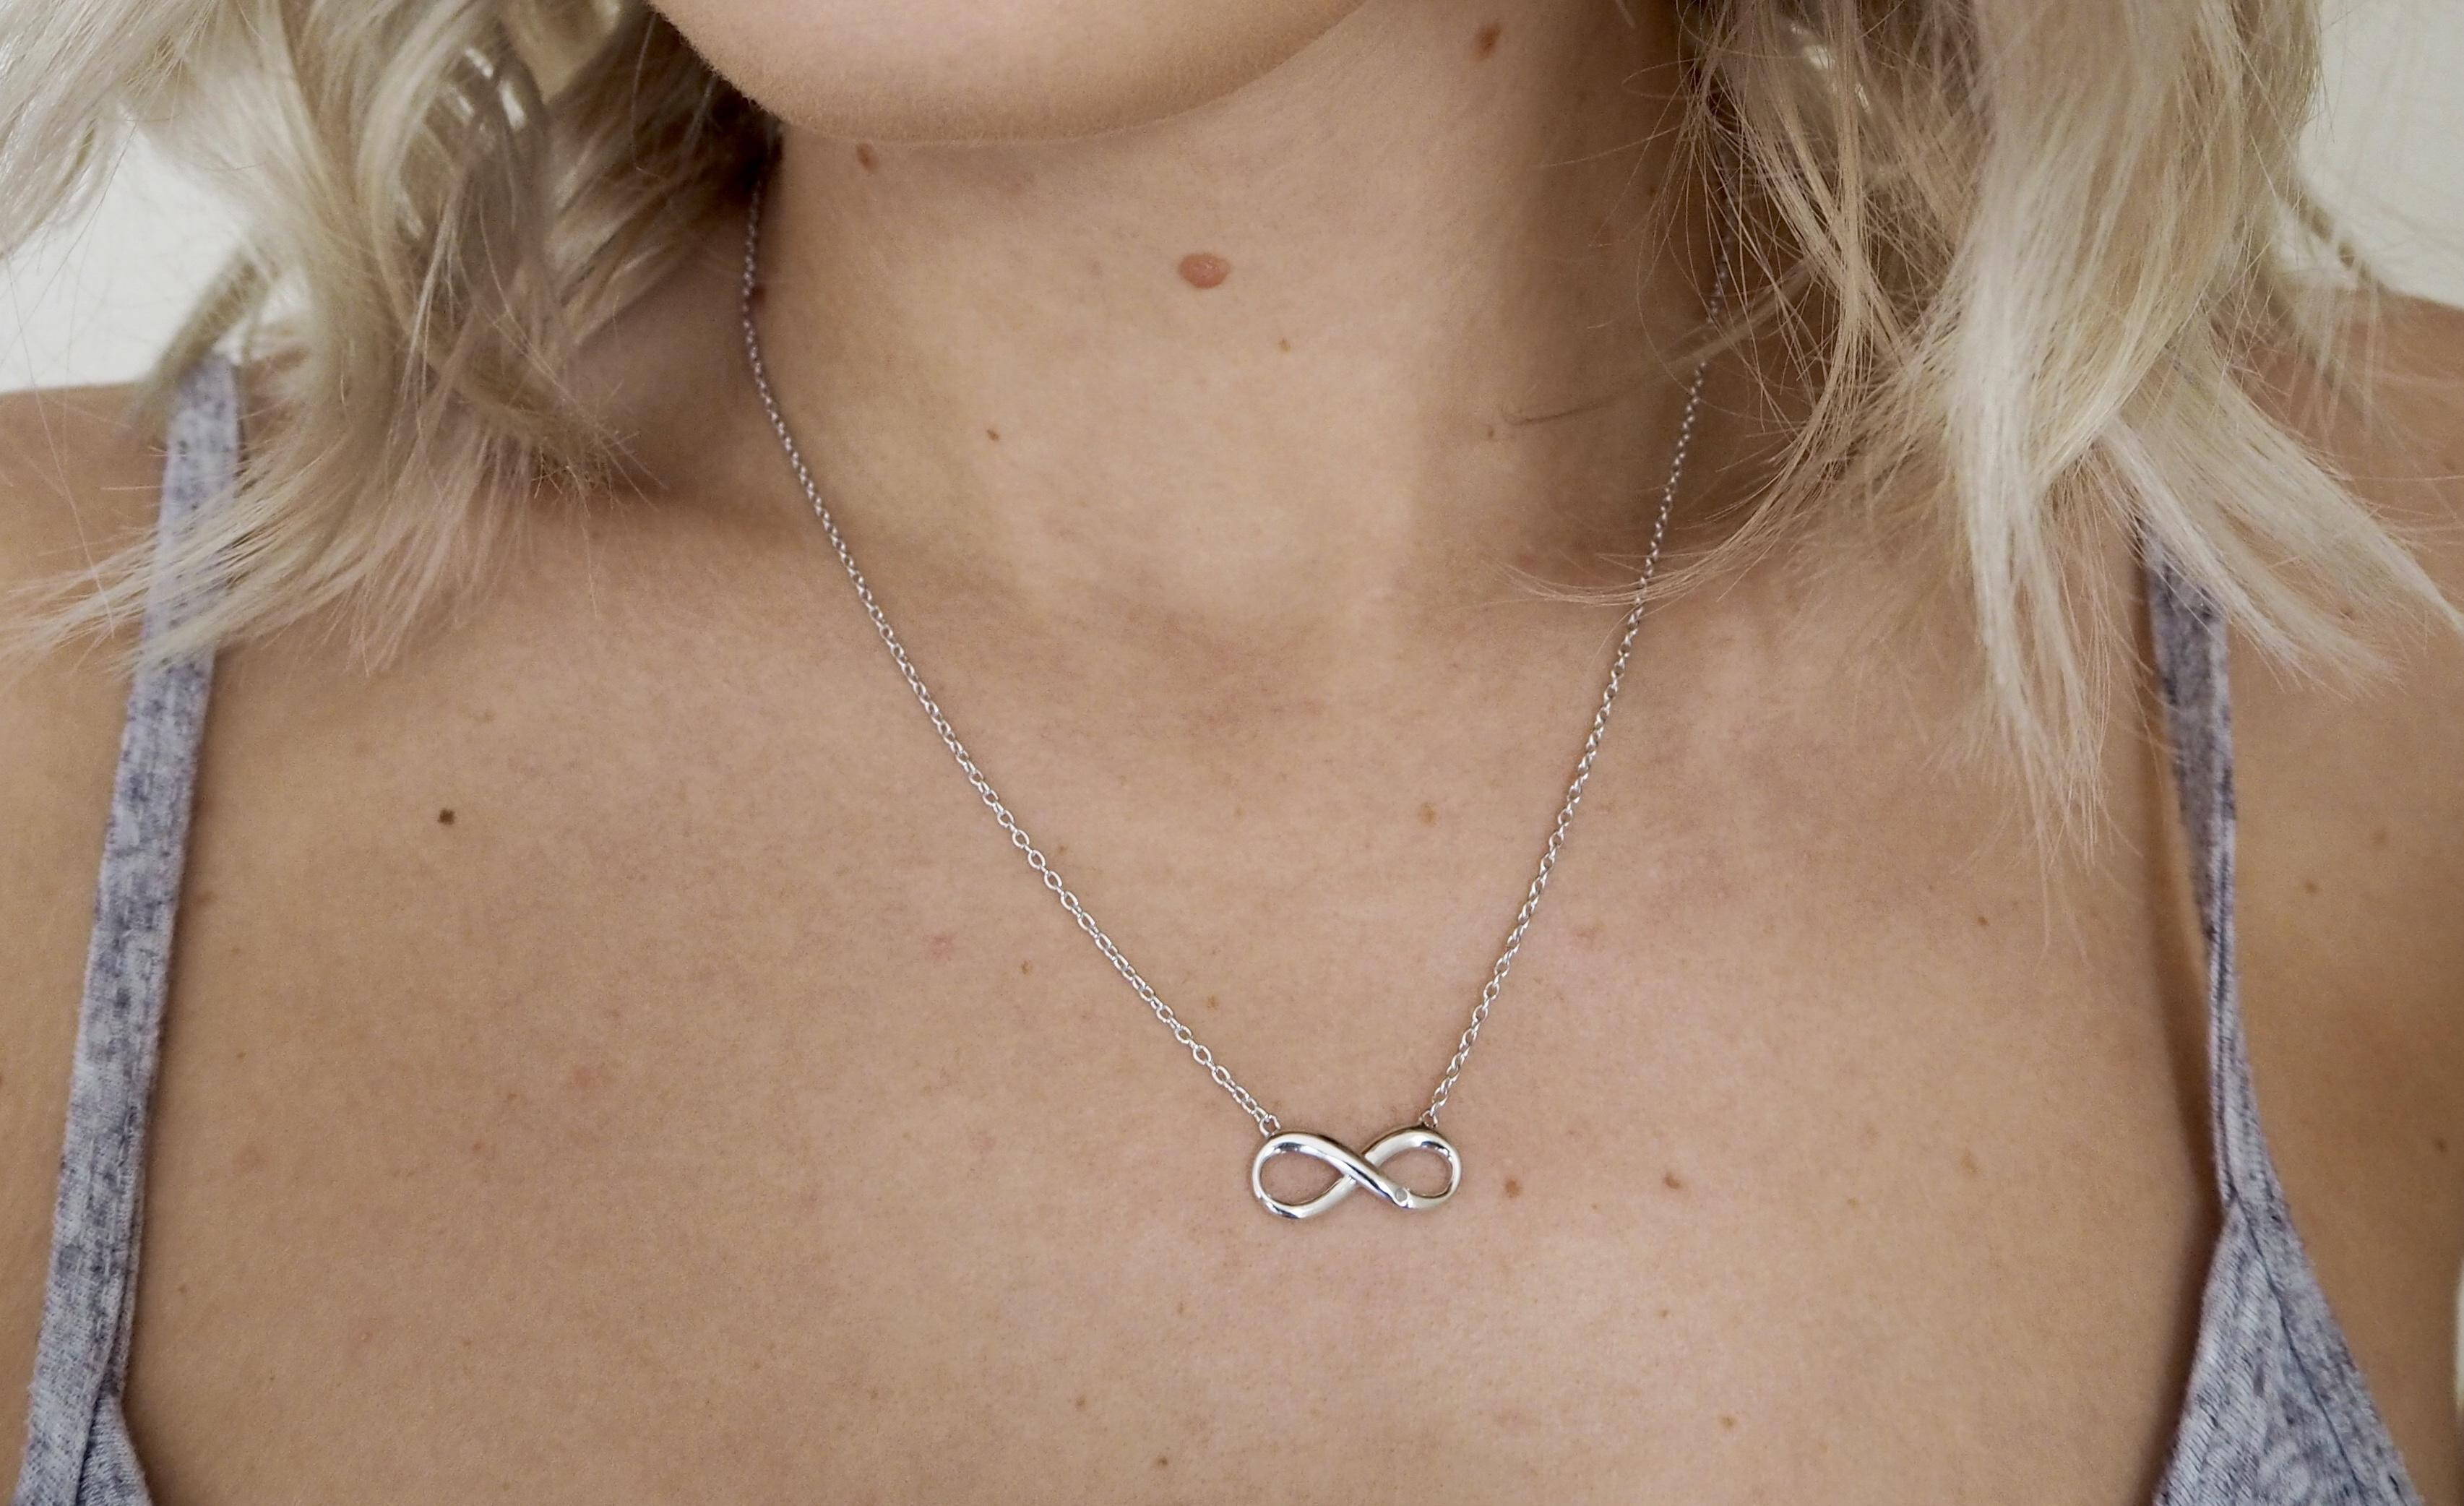 laura byrnes, lauras little locket. hot diamonds, infinity necklace, infinity bracelet,